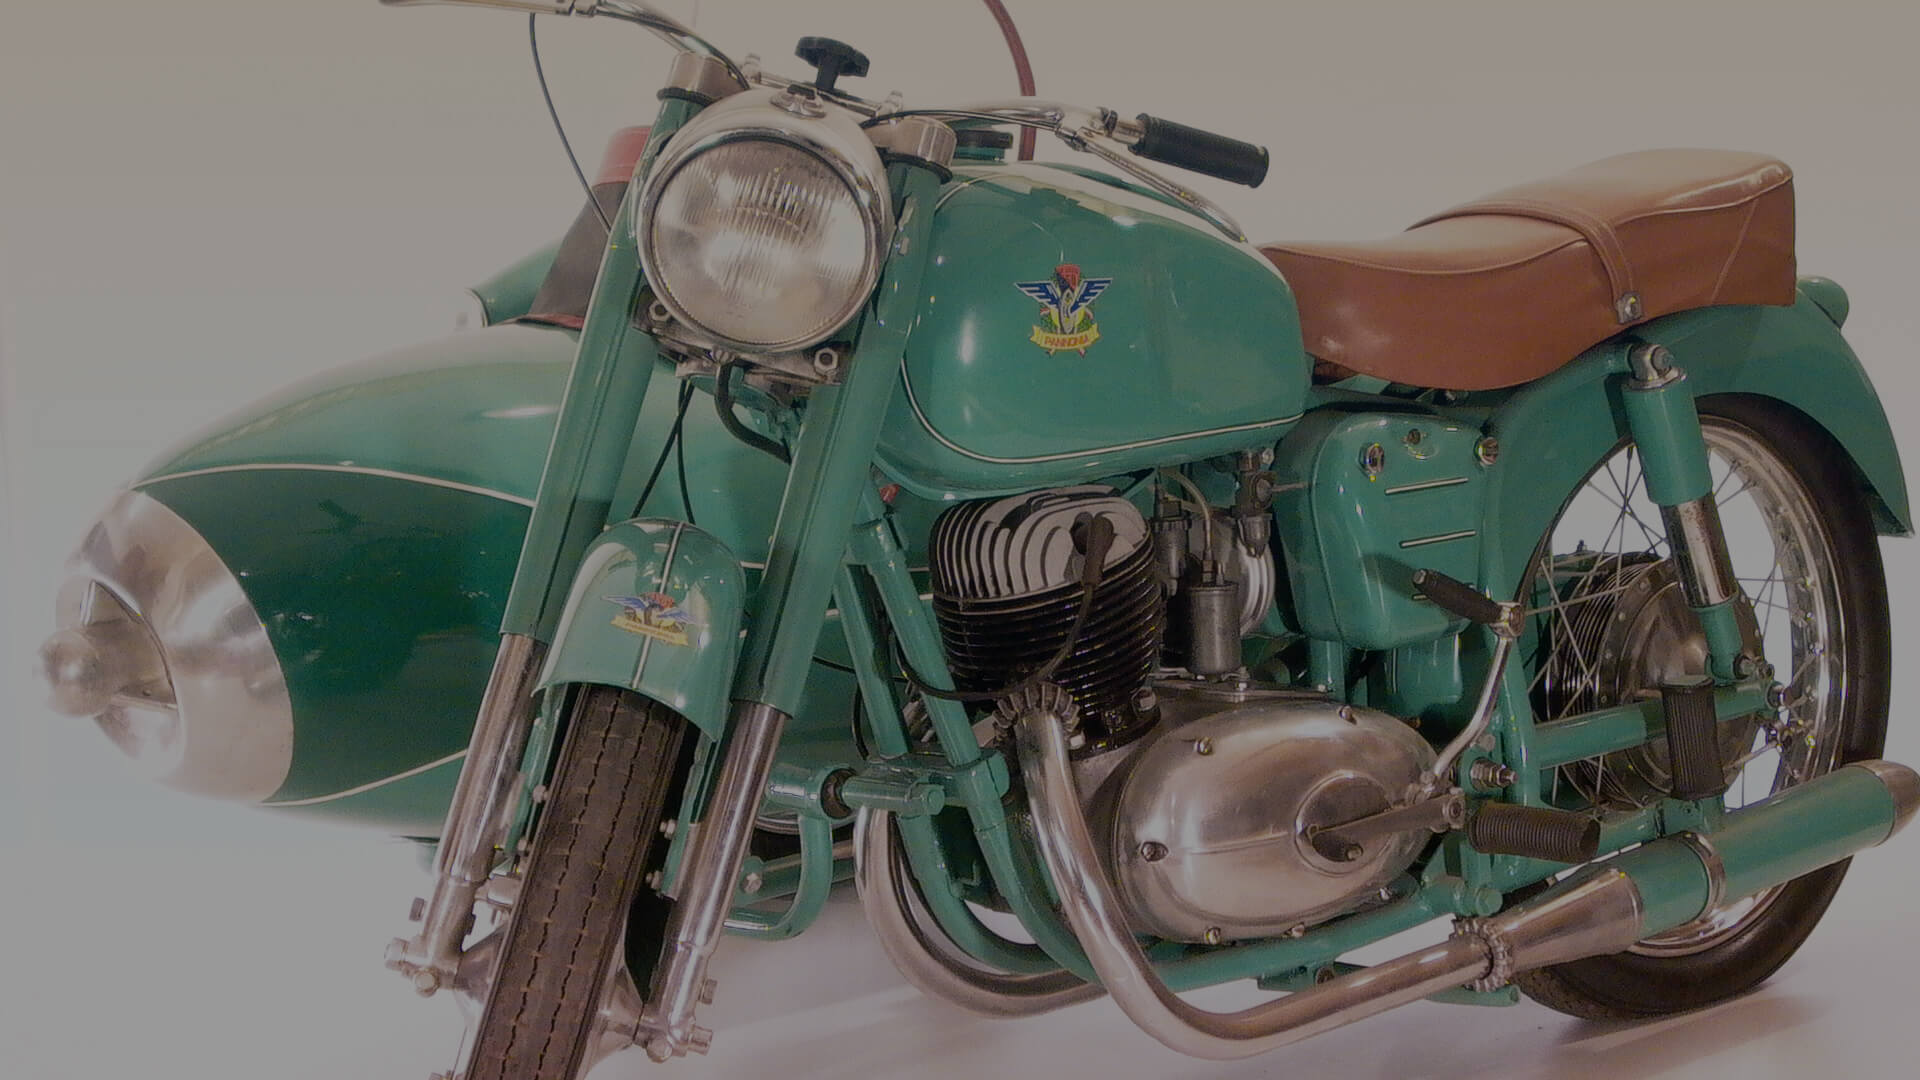 PANNONIA TLT, 247 cc, 1957